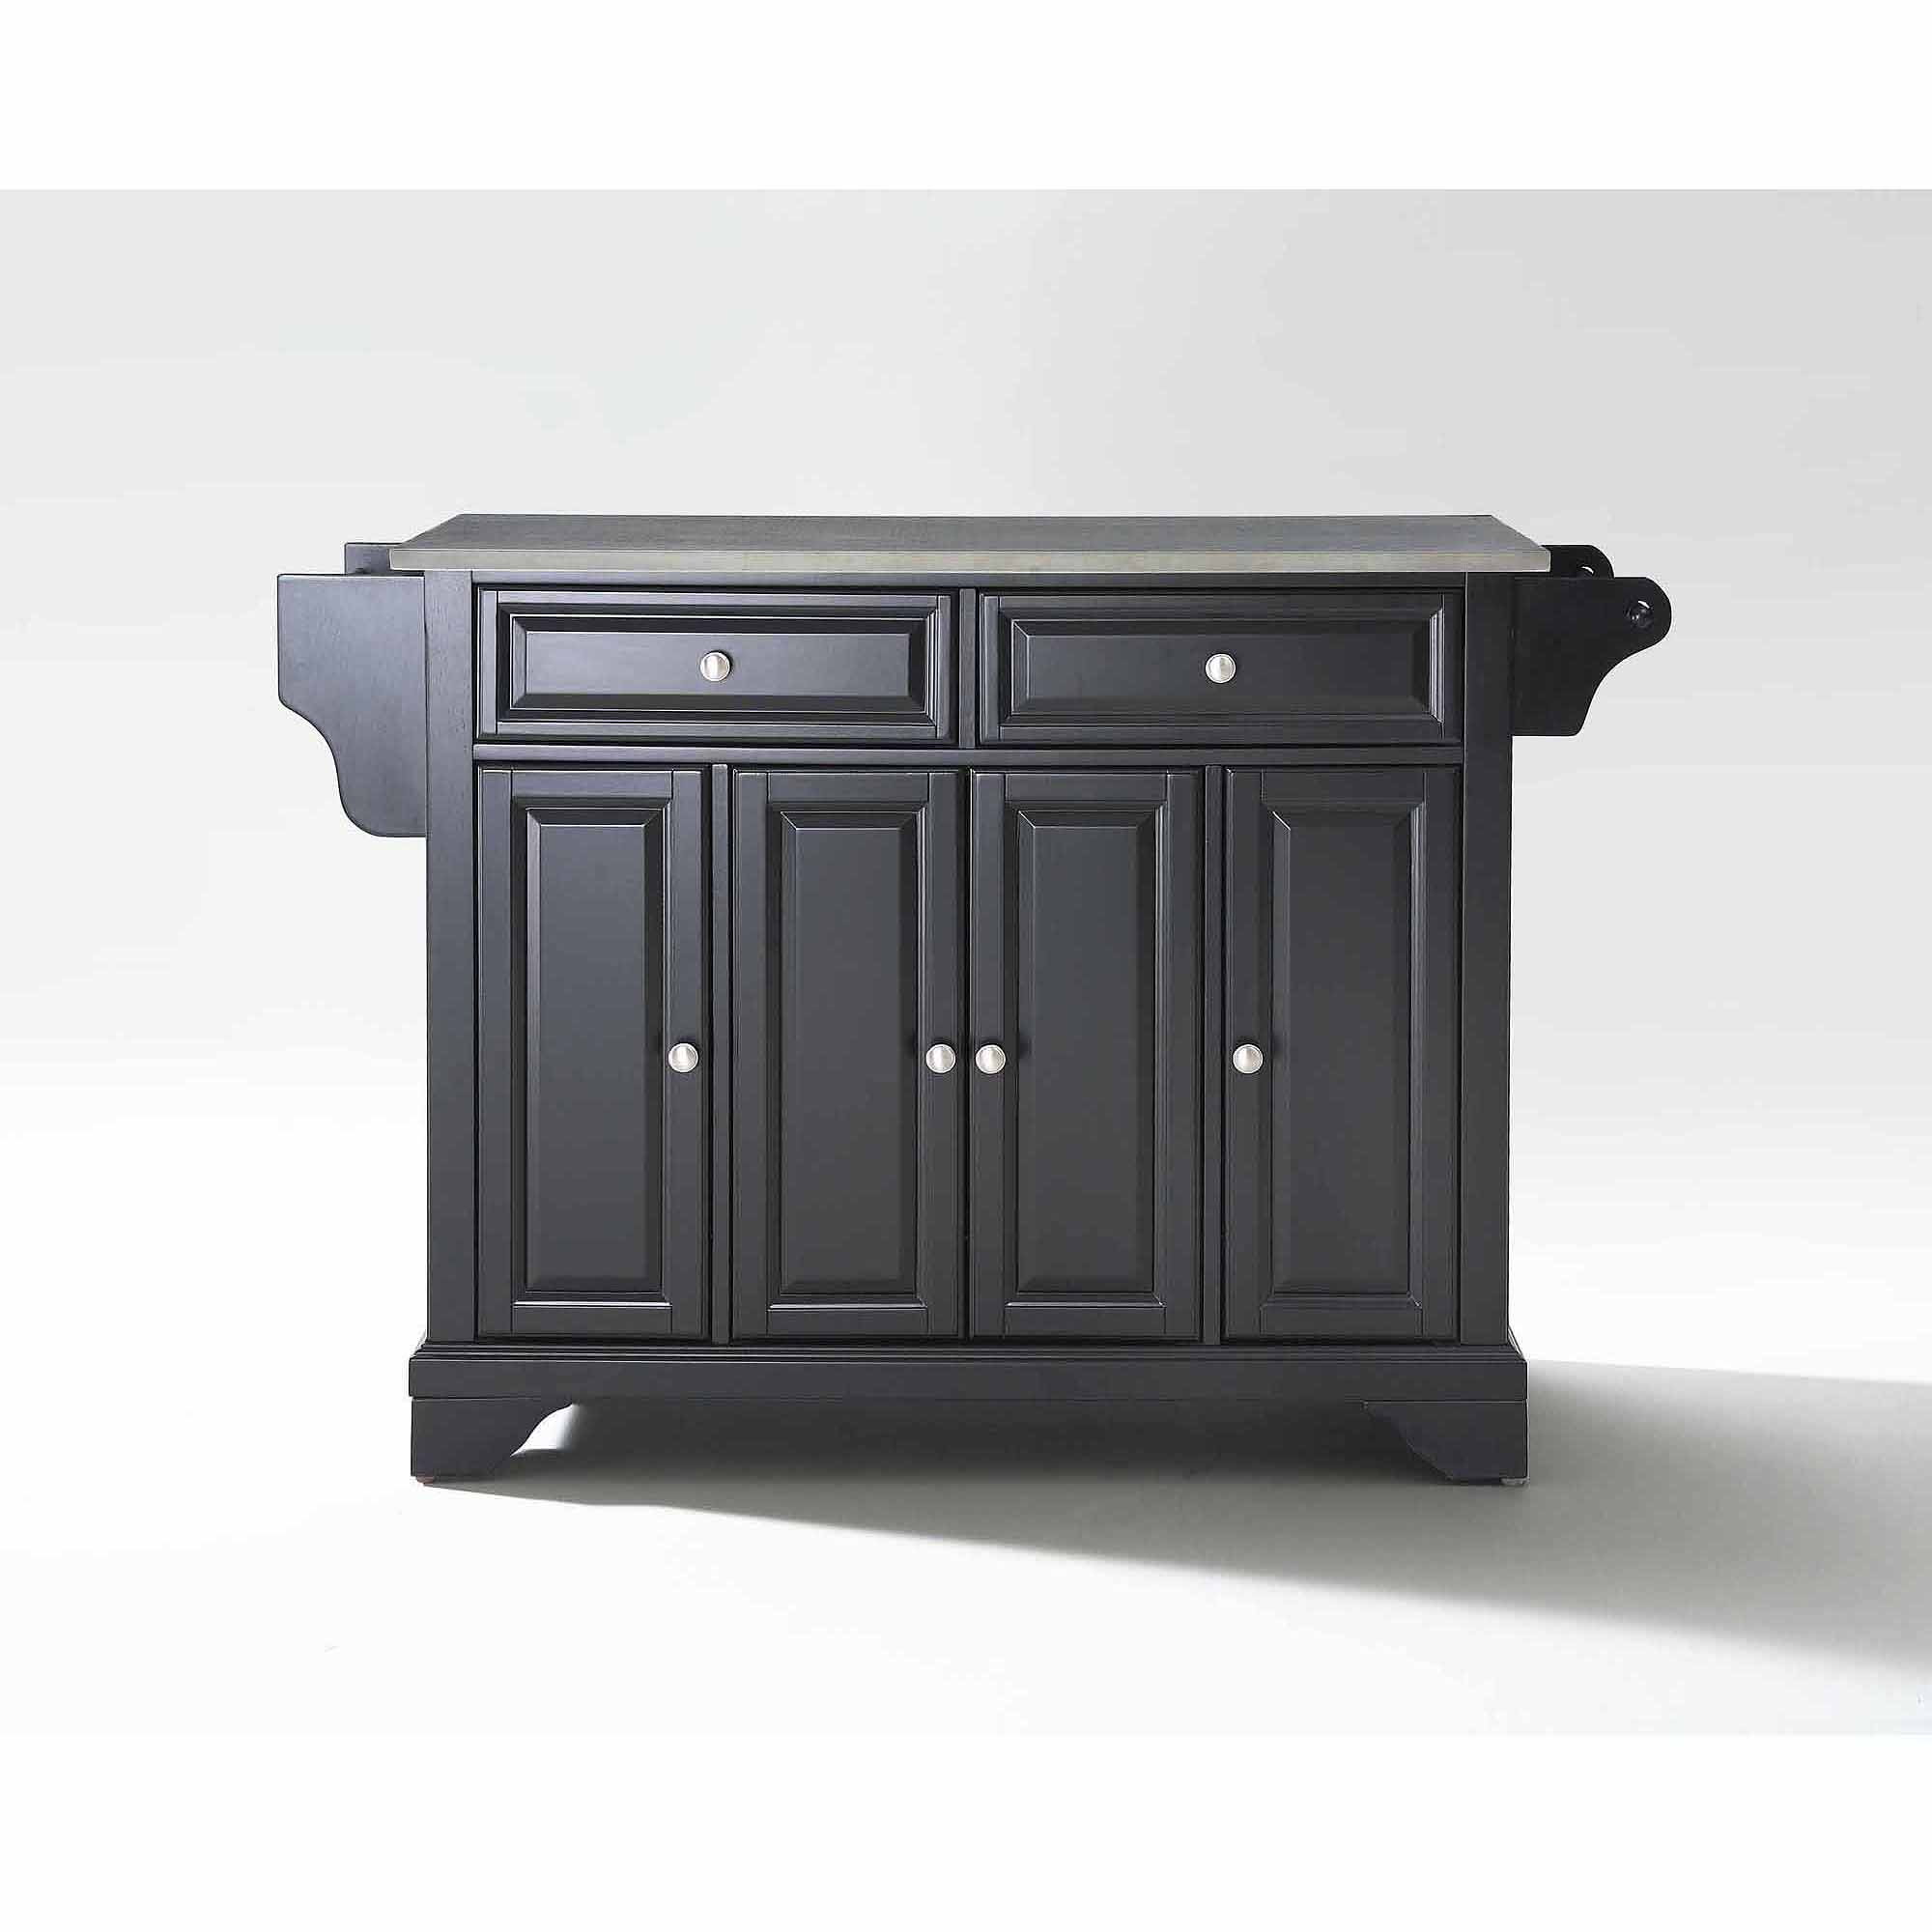 Crosley Furniture LaFayette Stainless Steel Top Kitchen Island